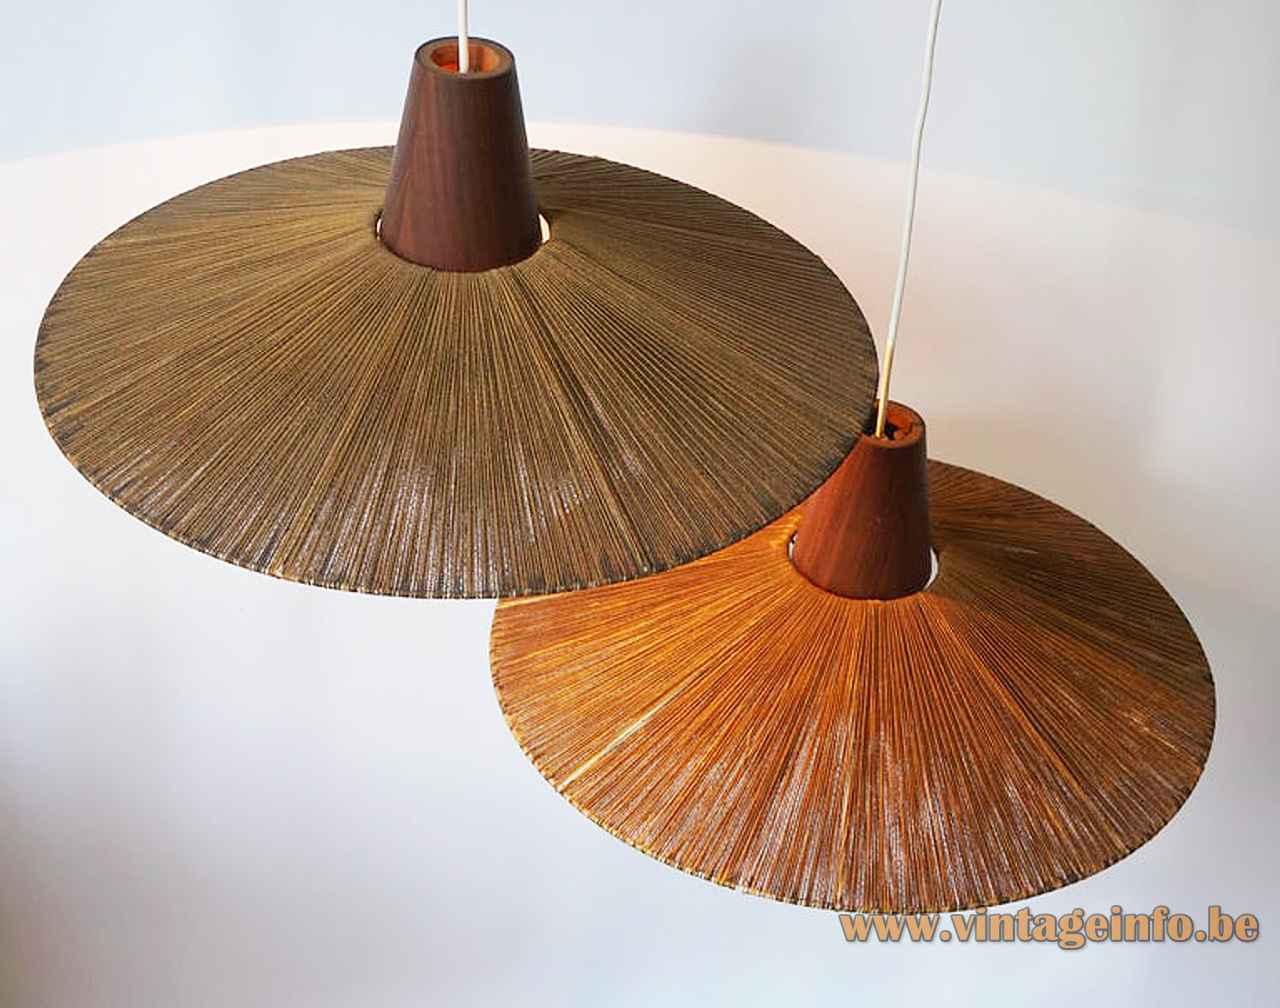 Temde sisal pendant lamp round conical cord braid lampshade teak wood cone 1950s 1960s top view